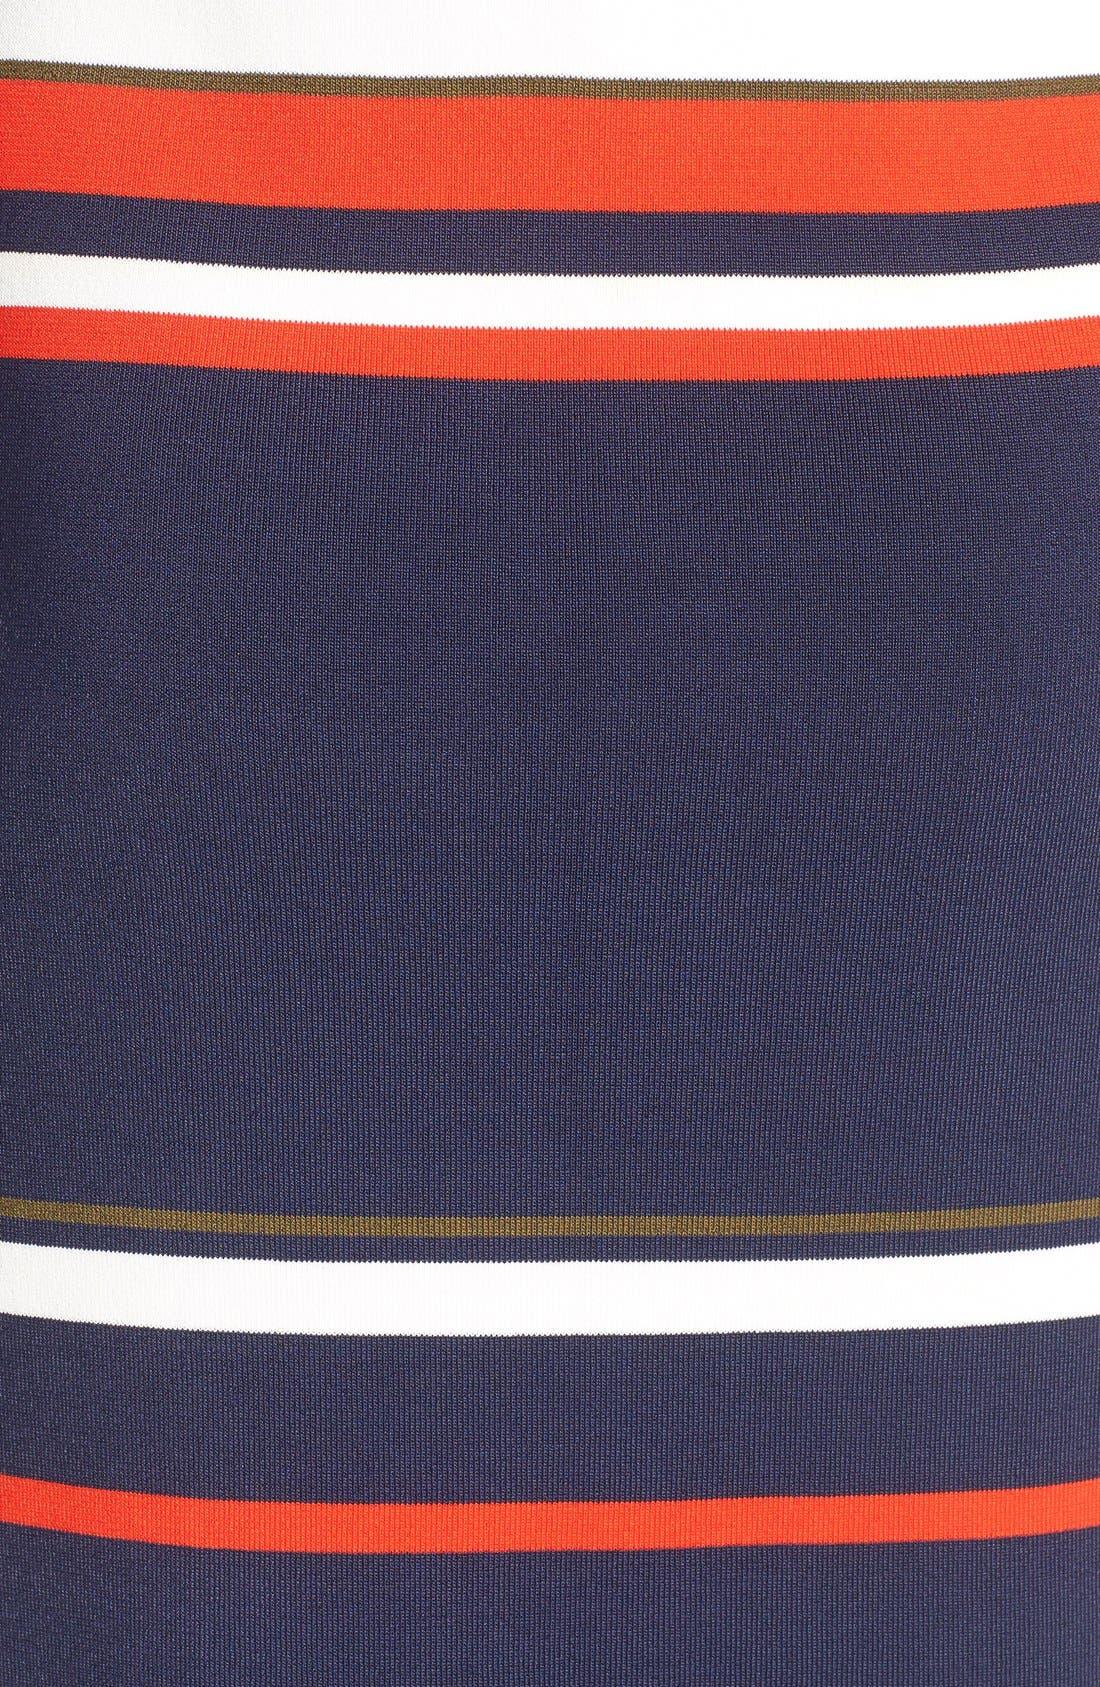 Sleeveless Mock Neck Knit Dress,                             Alternate thumbnail 31, color,